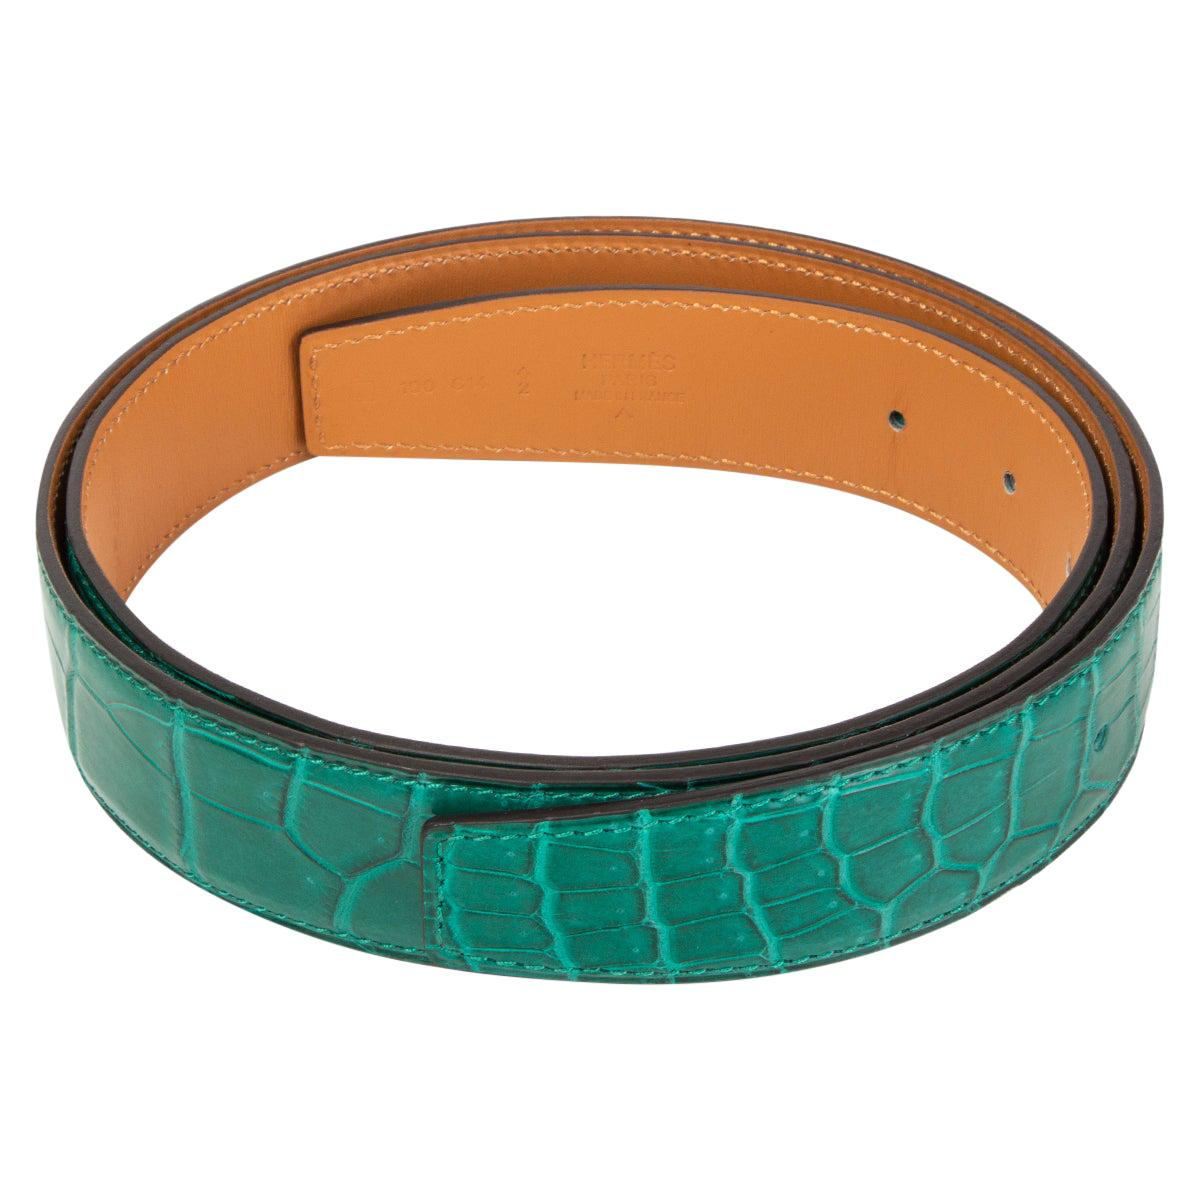 HERMES Malachite green SHINY PRORSUS CROCODILE 32mm Belt Strap 100